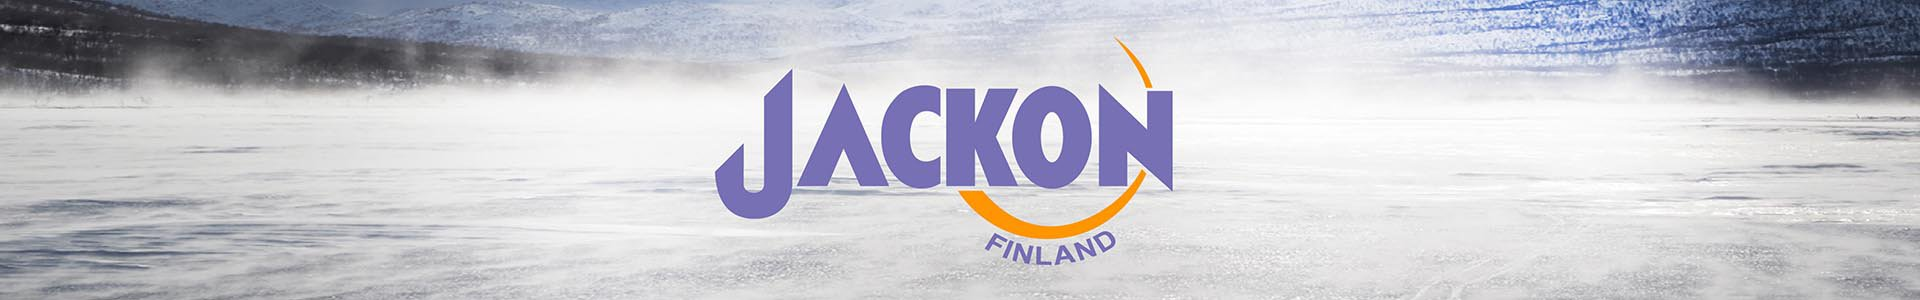 Jackon Finland